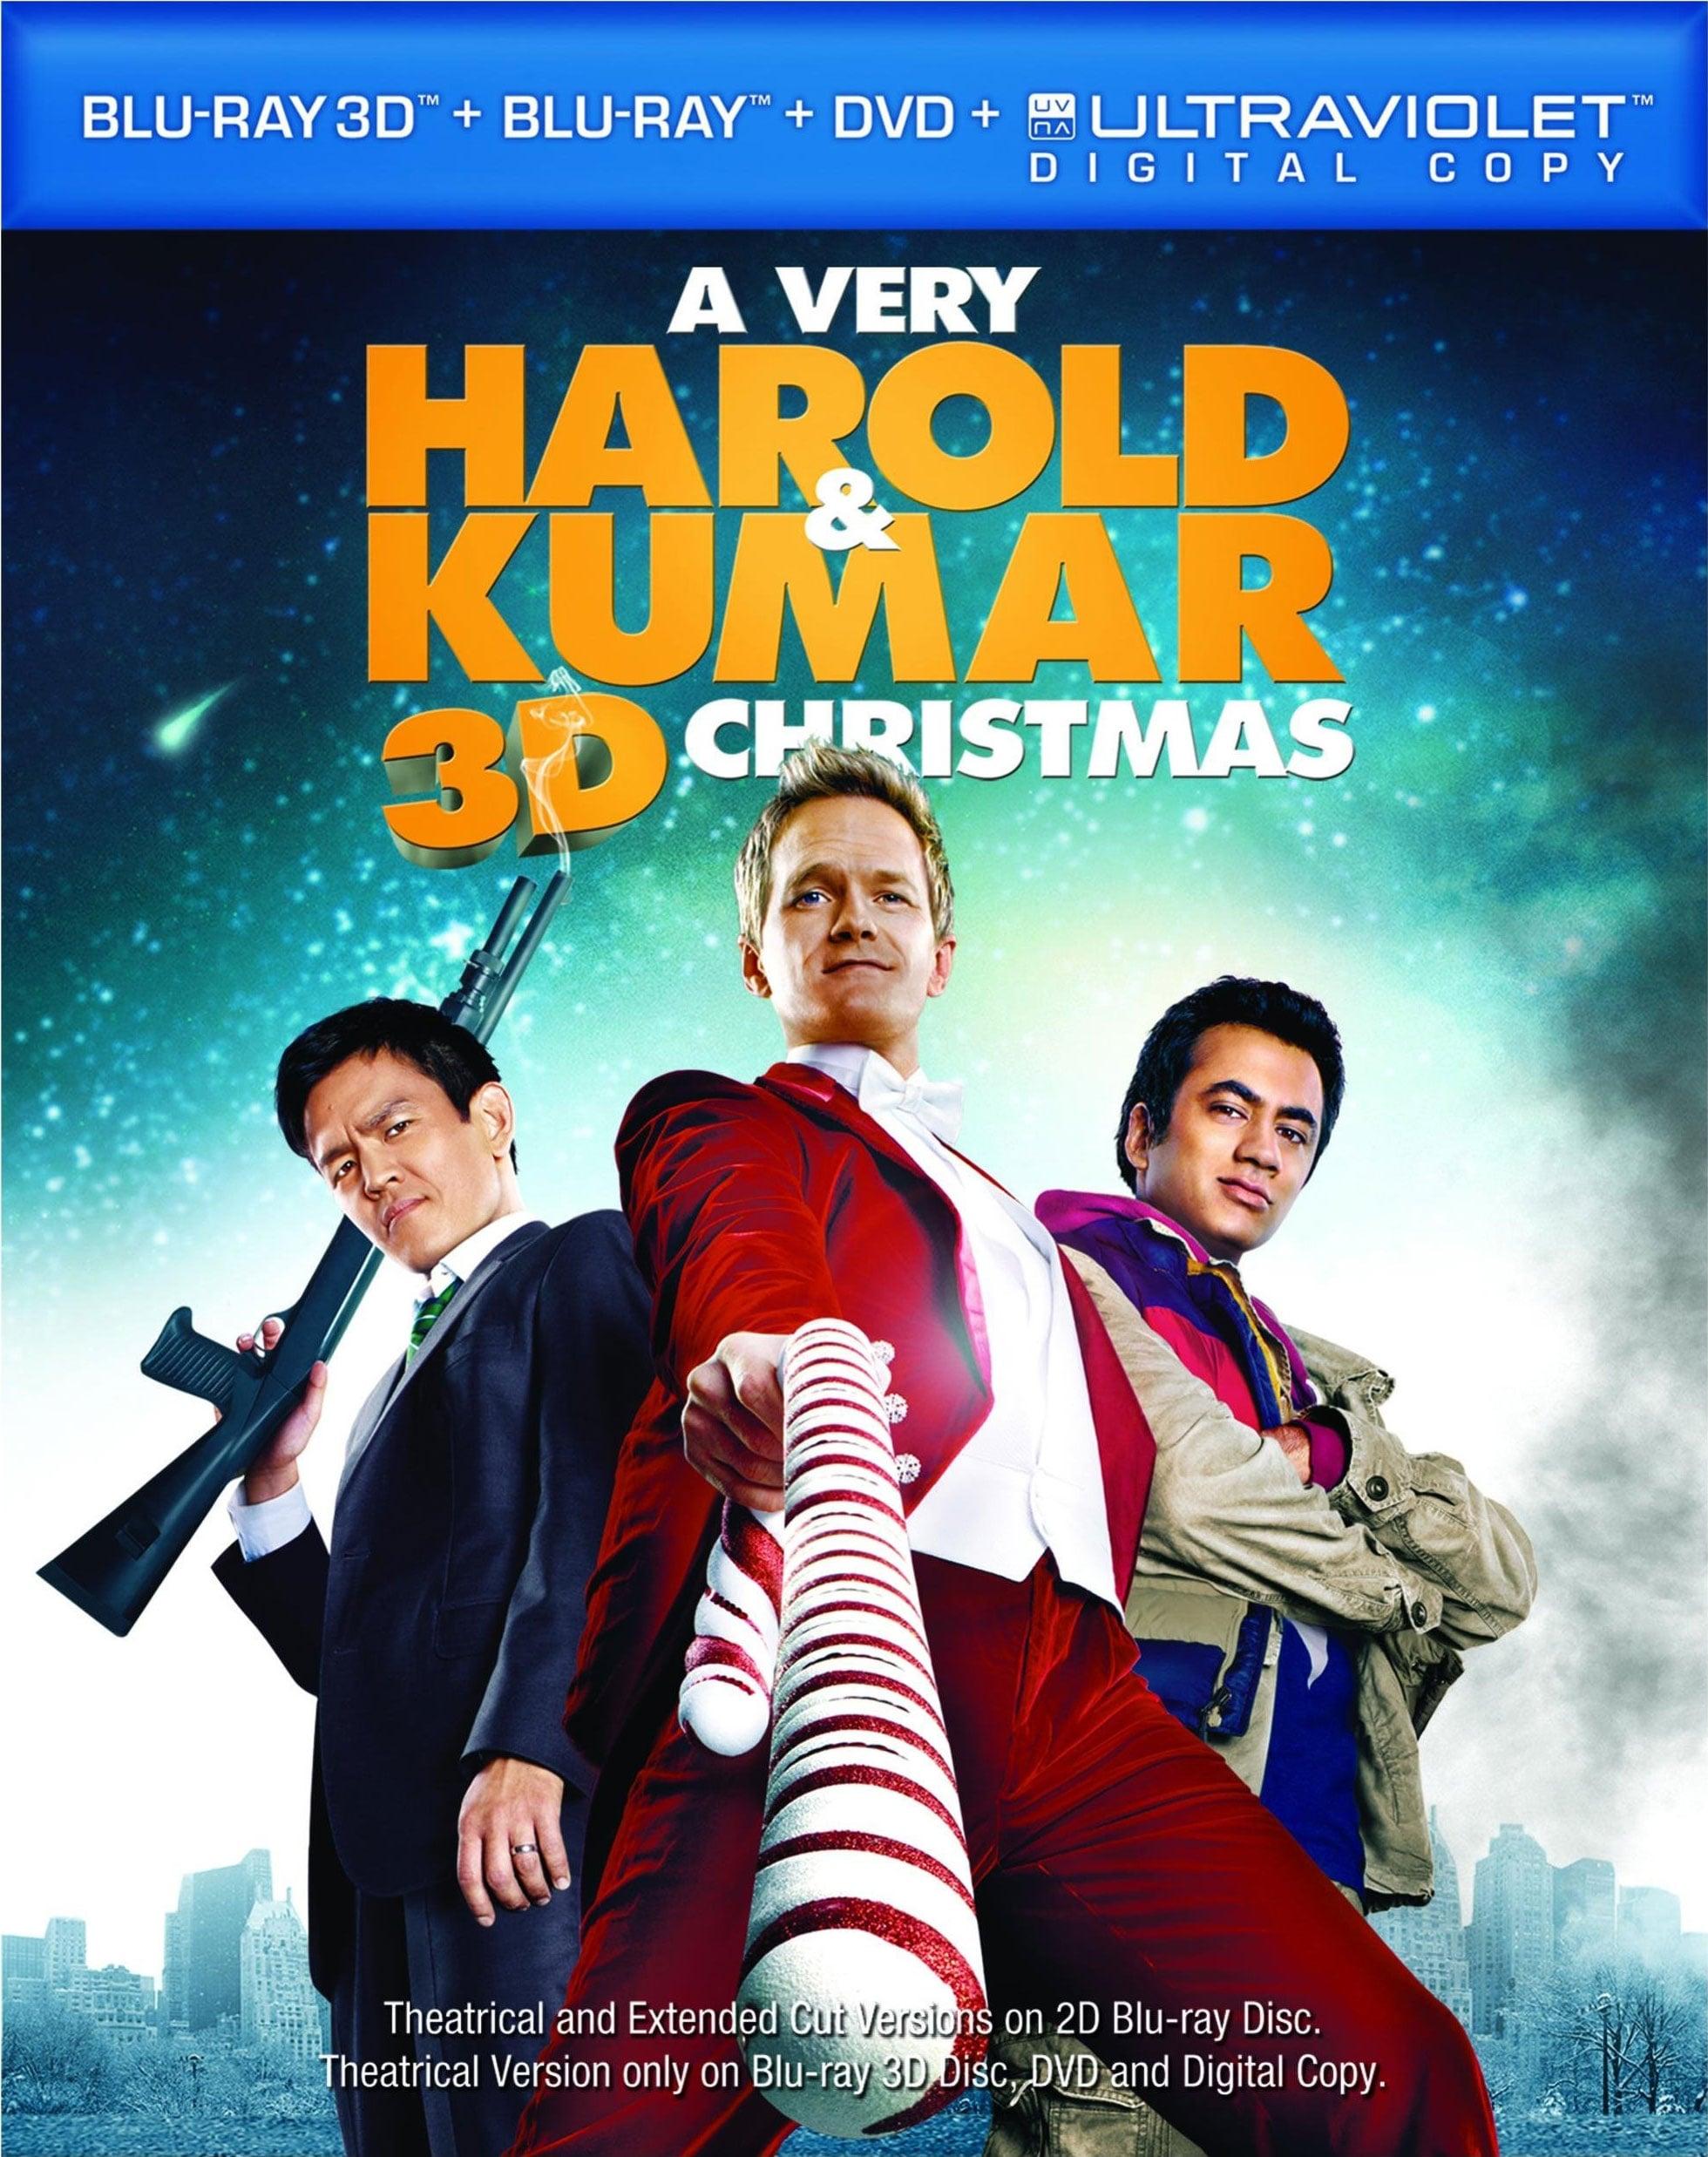 A Very Harold & Kumar 3D Christmas (Blu-ray Disc)